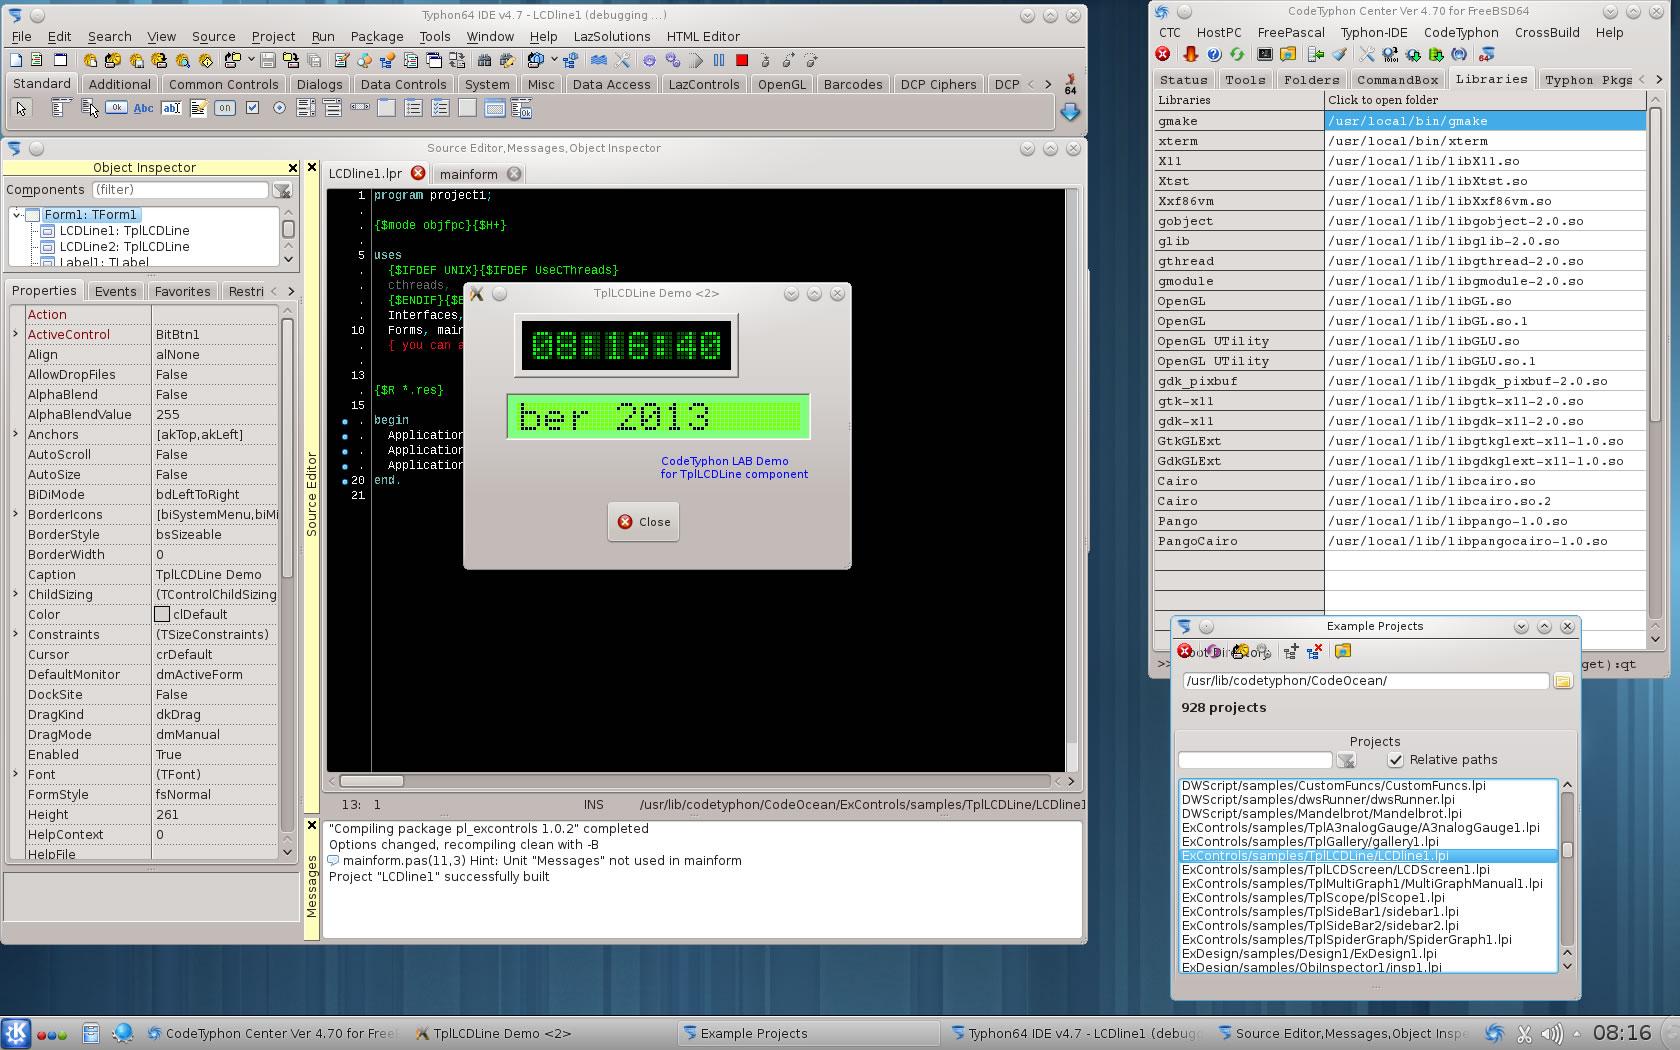 FreeBSD64-34.jpg